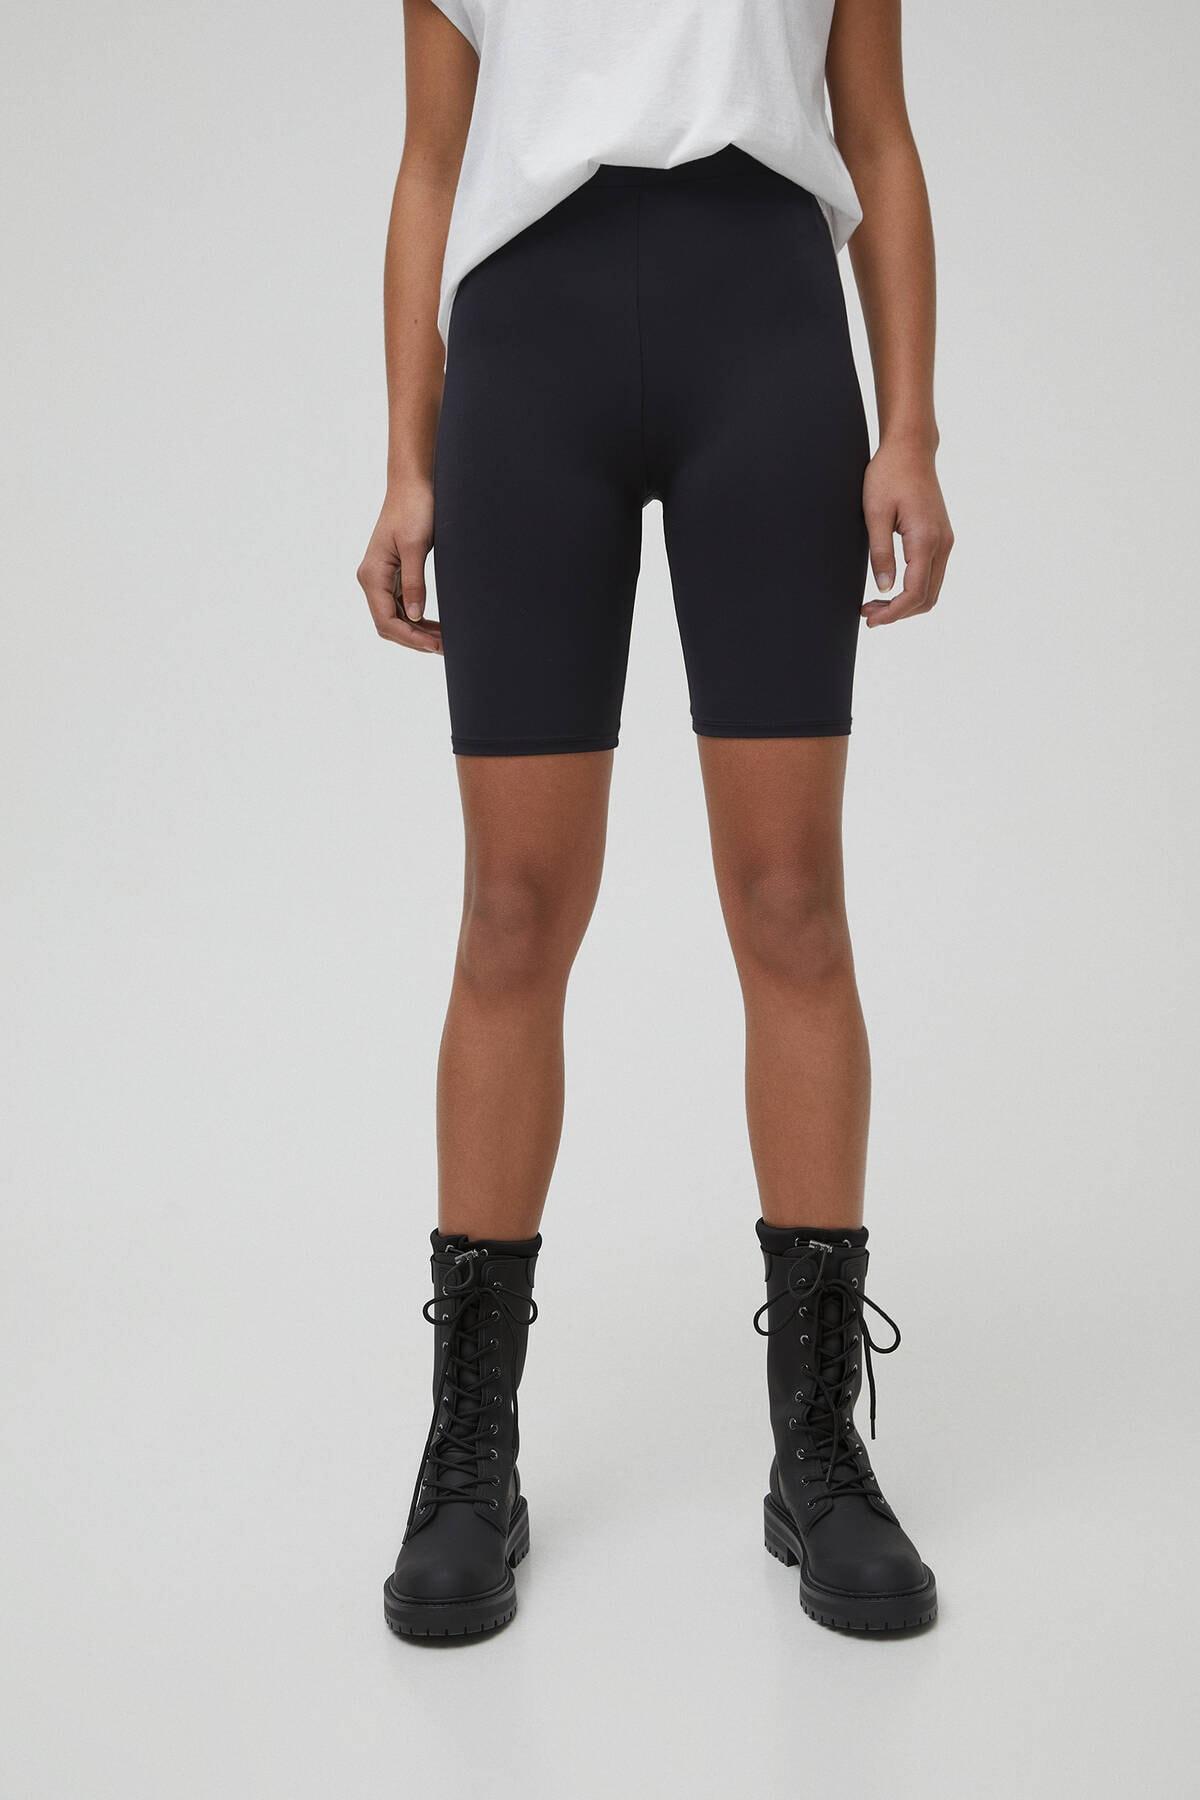 Pull & Bear Kadın Siyah Siyah Basic Bisikletçi Taytı 05690313